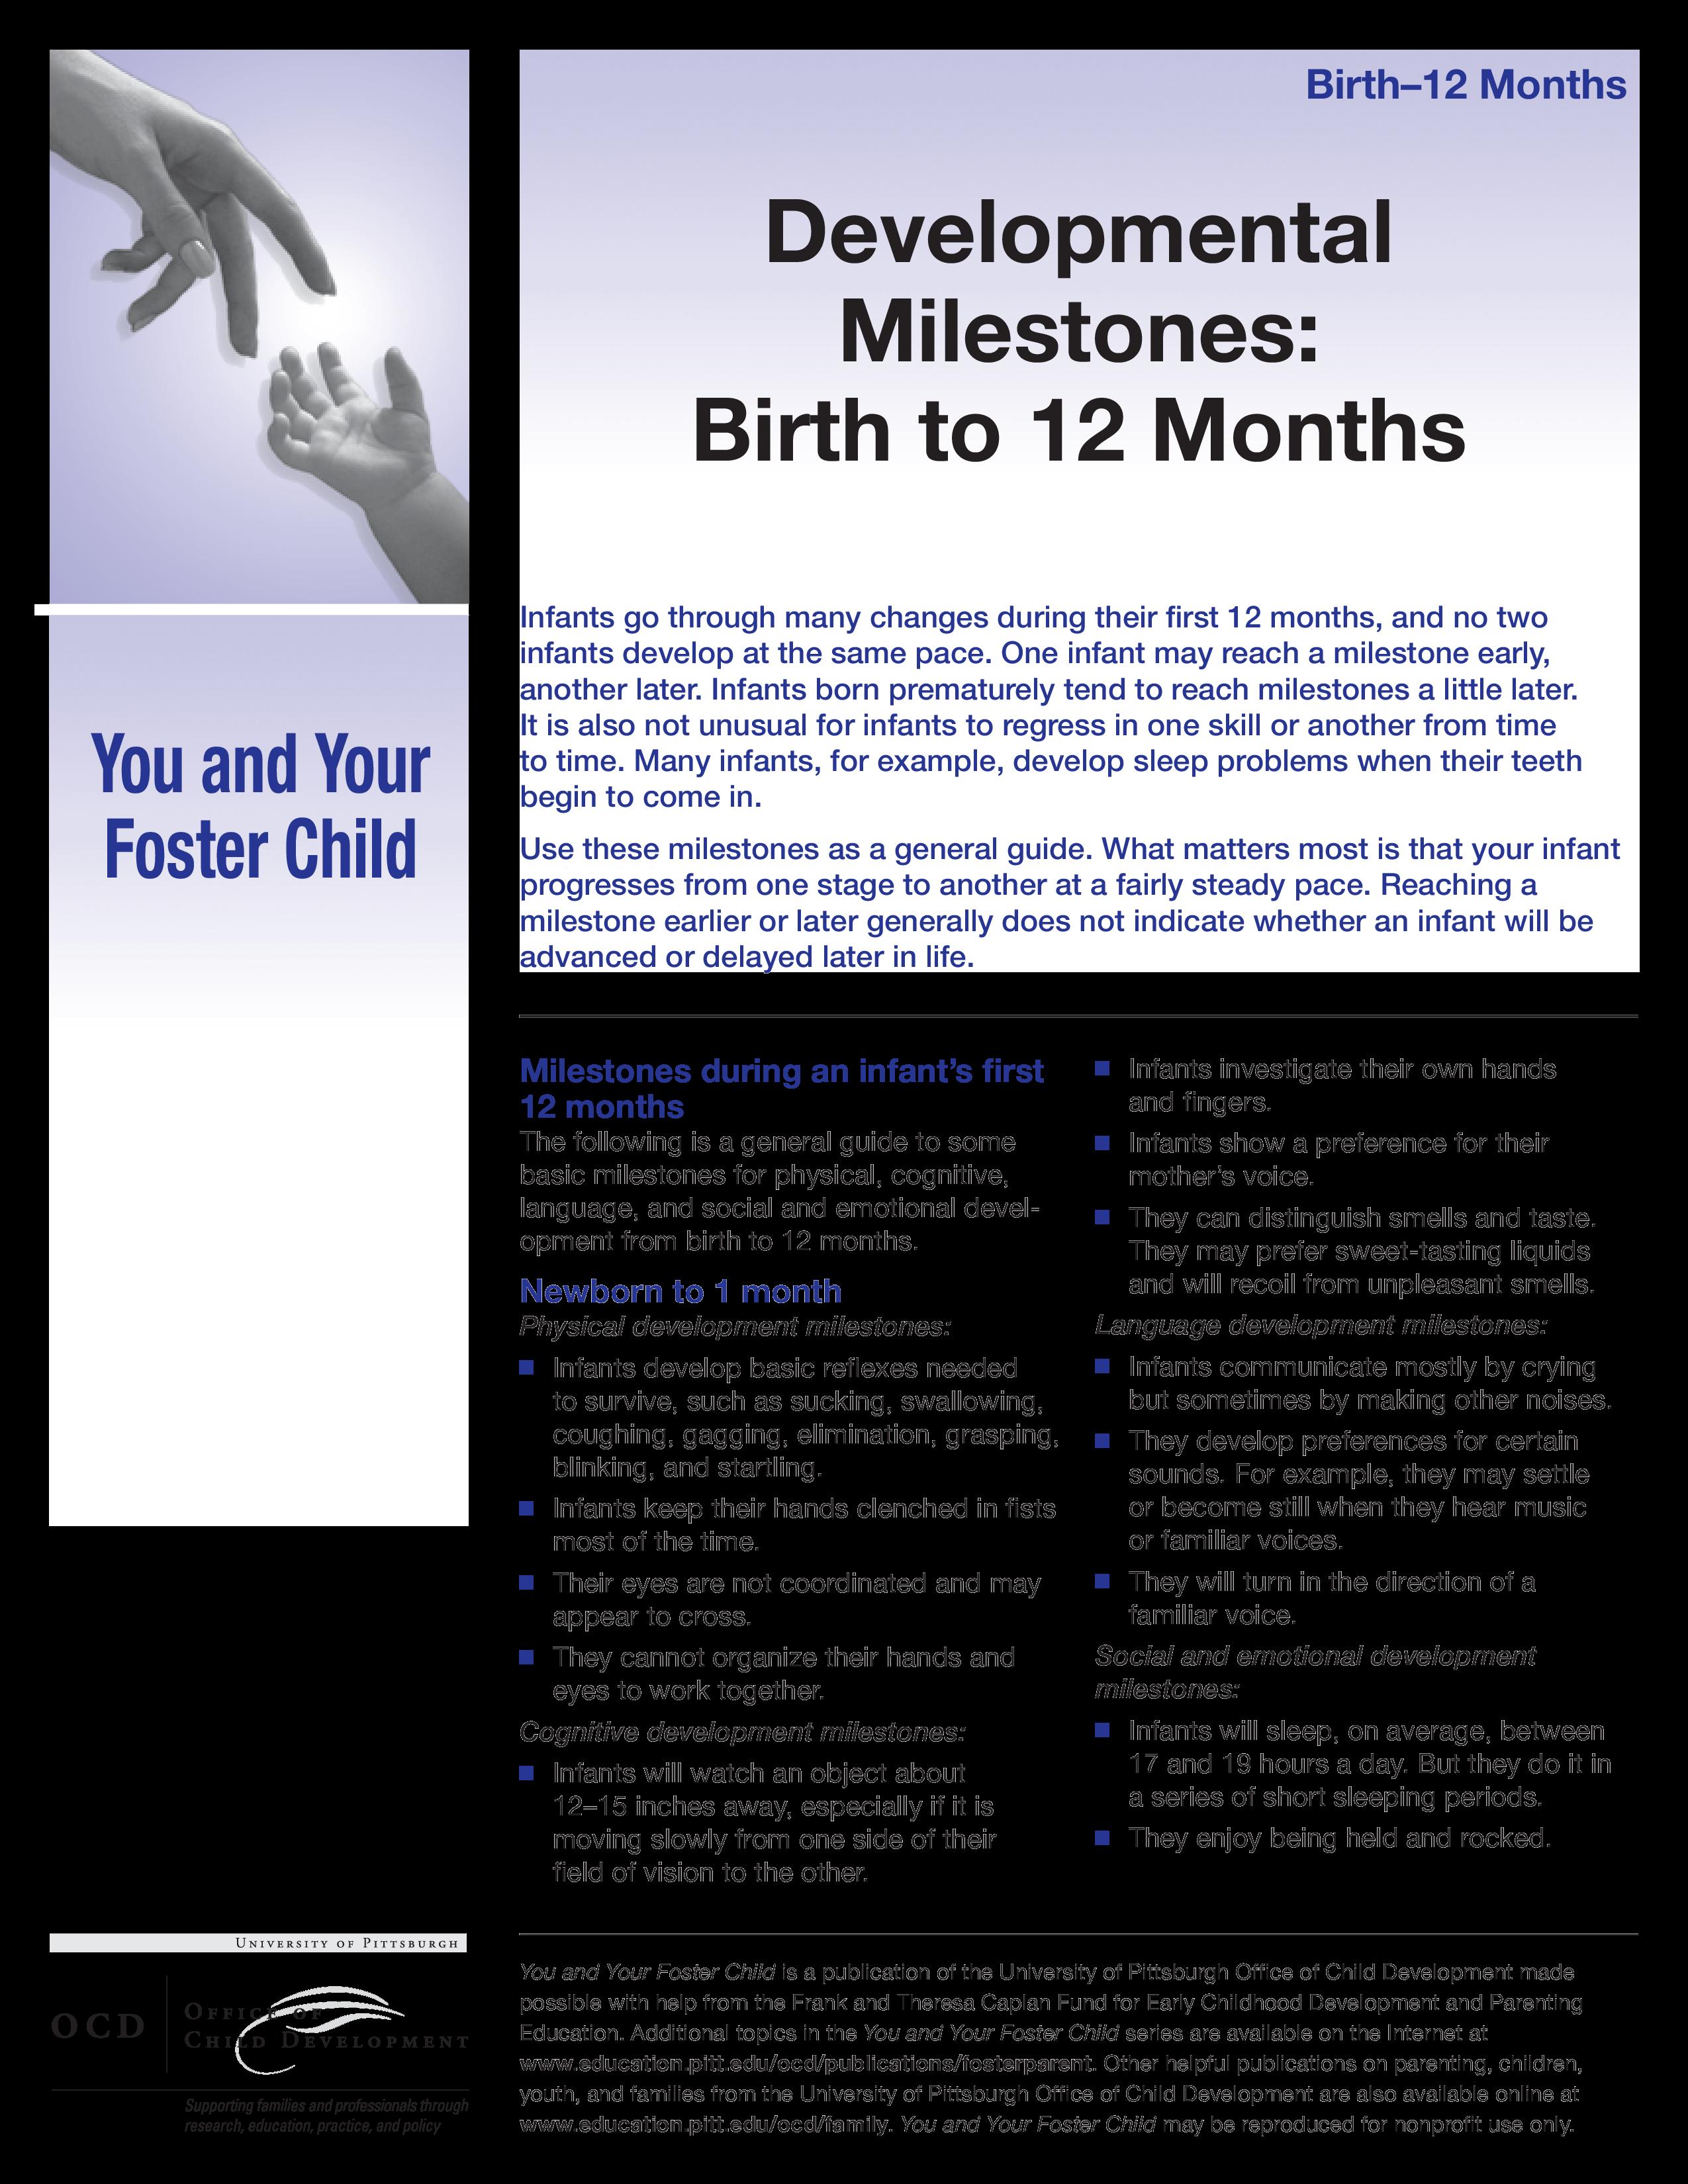 Baby Milestones Chart Template | Free Premature Baby Development Chart Templates At